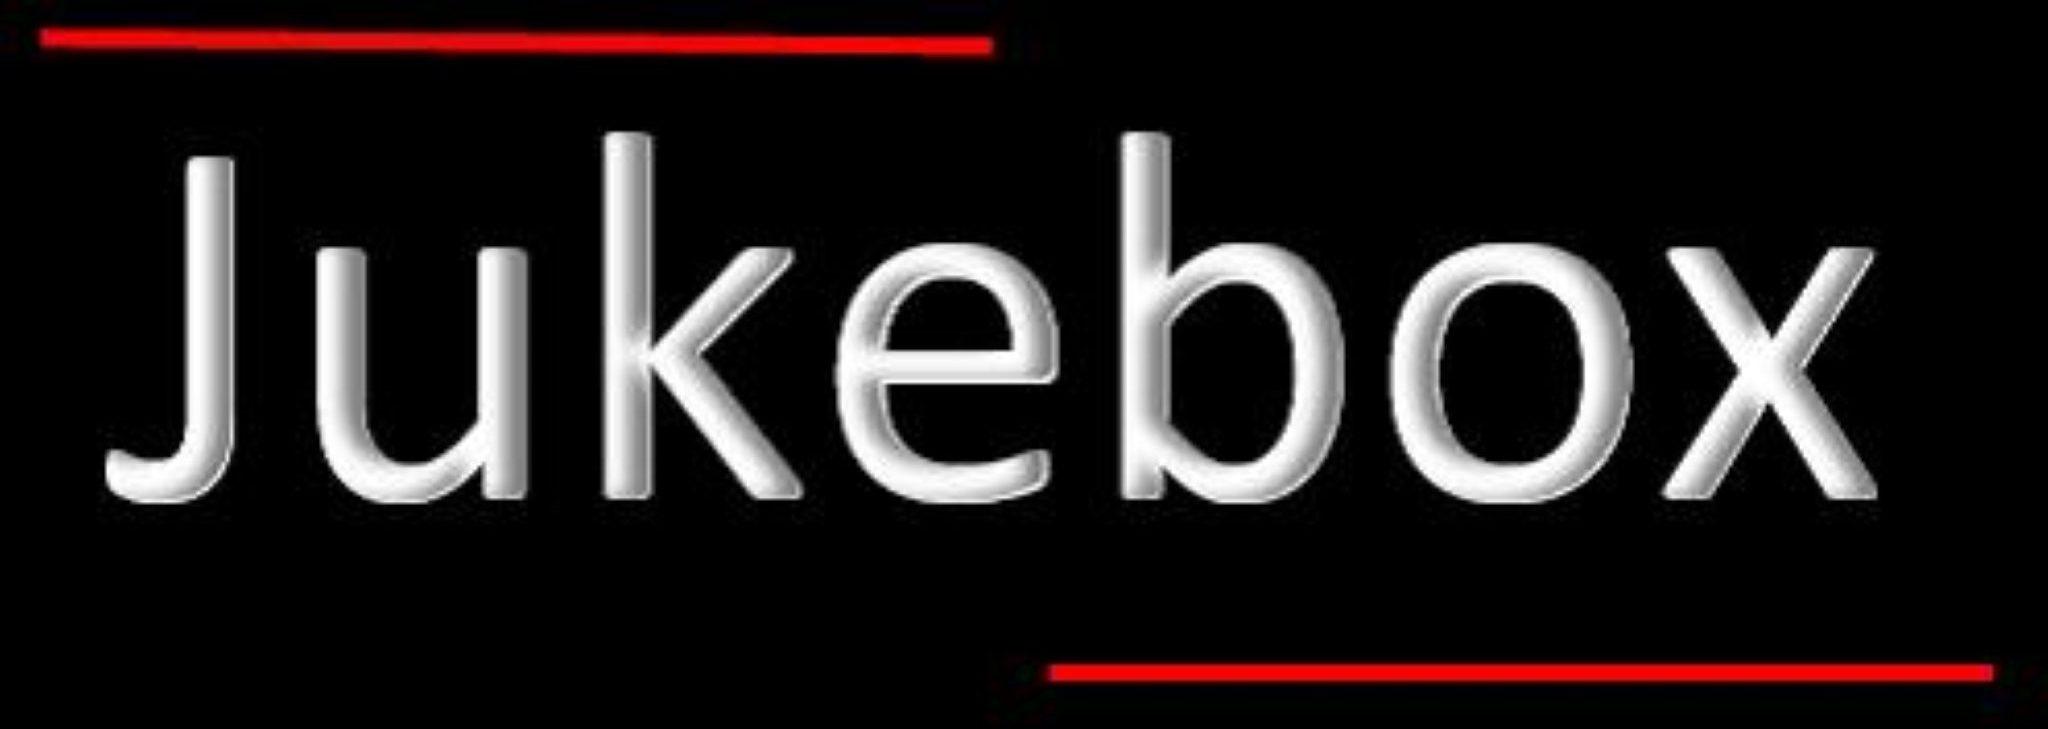 Neue Jukeboxseite